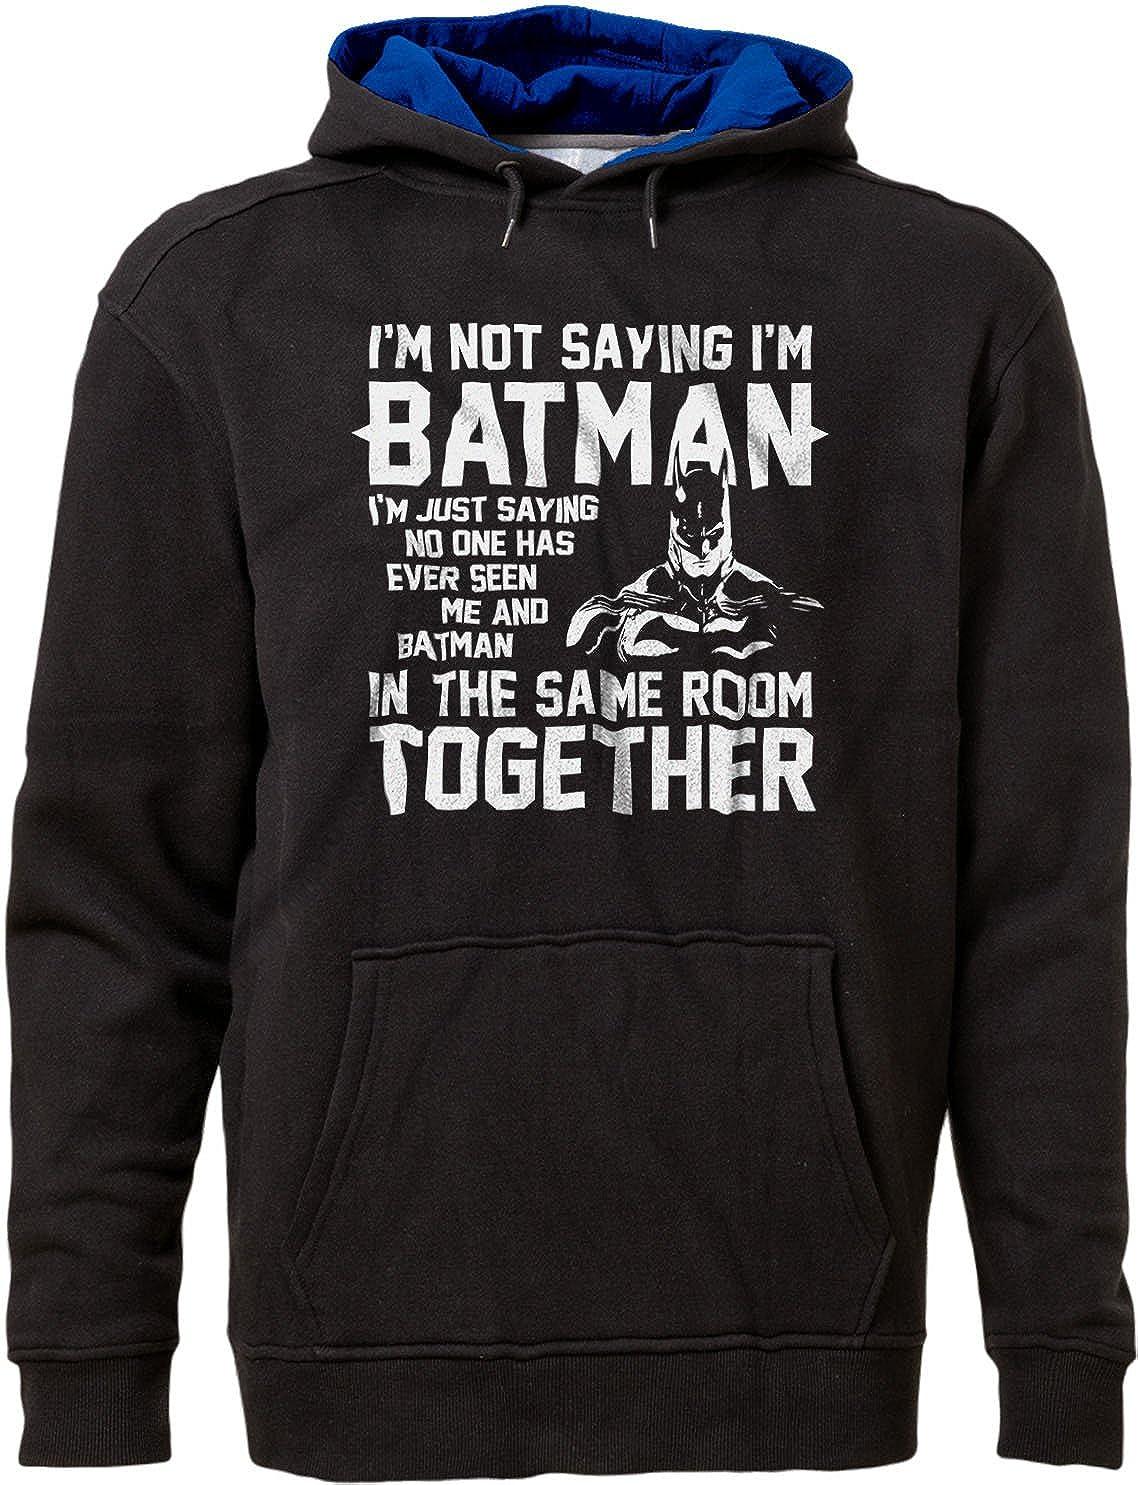 Man Super Hero Justice League Hoodie Black//Royal XS BSW Mens Im not Saying Im BAT